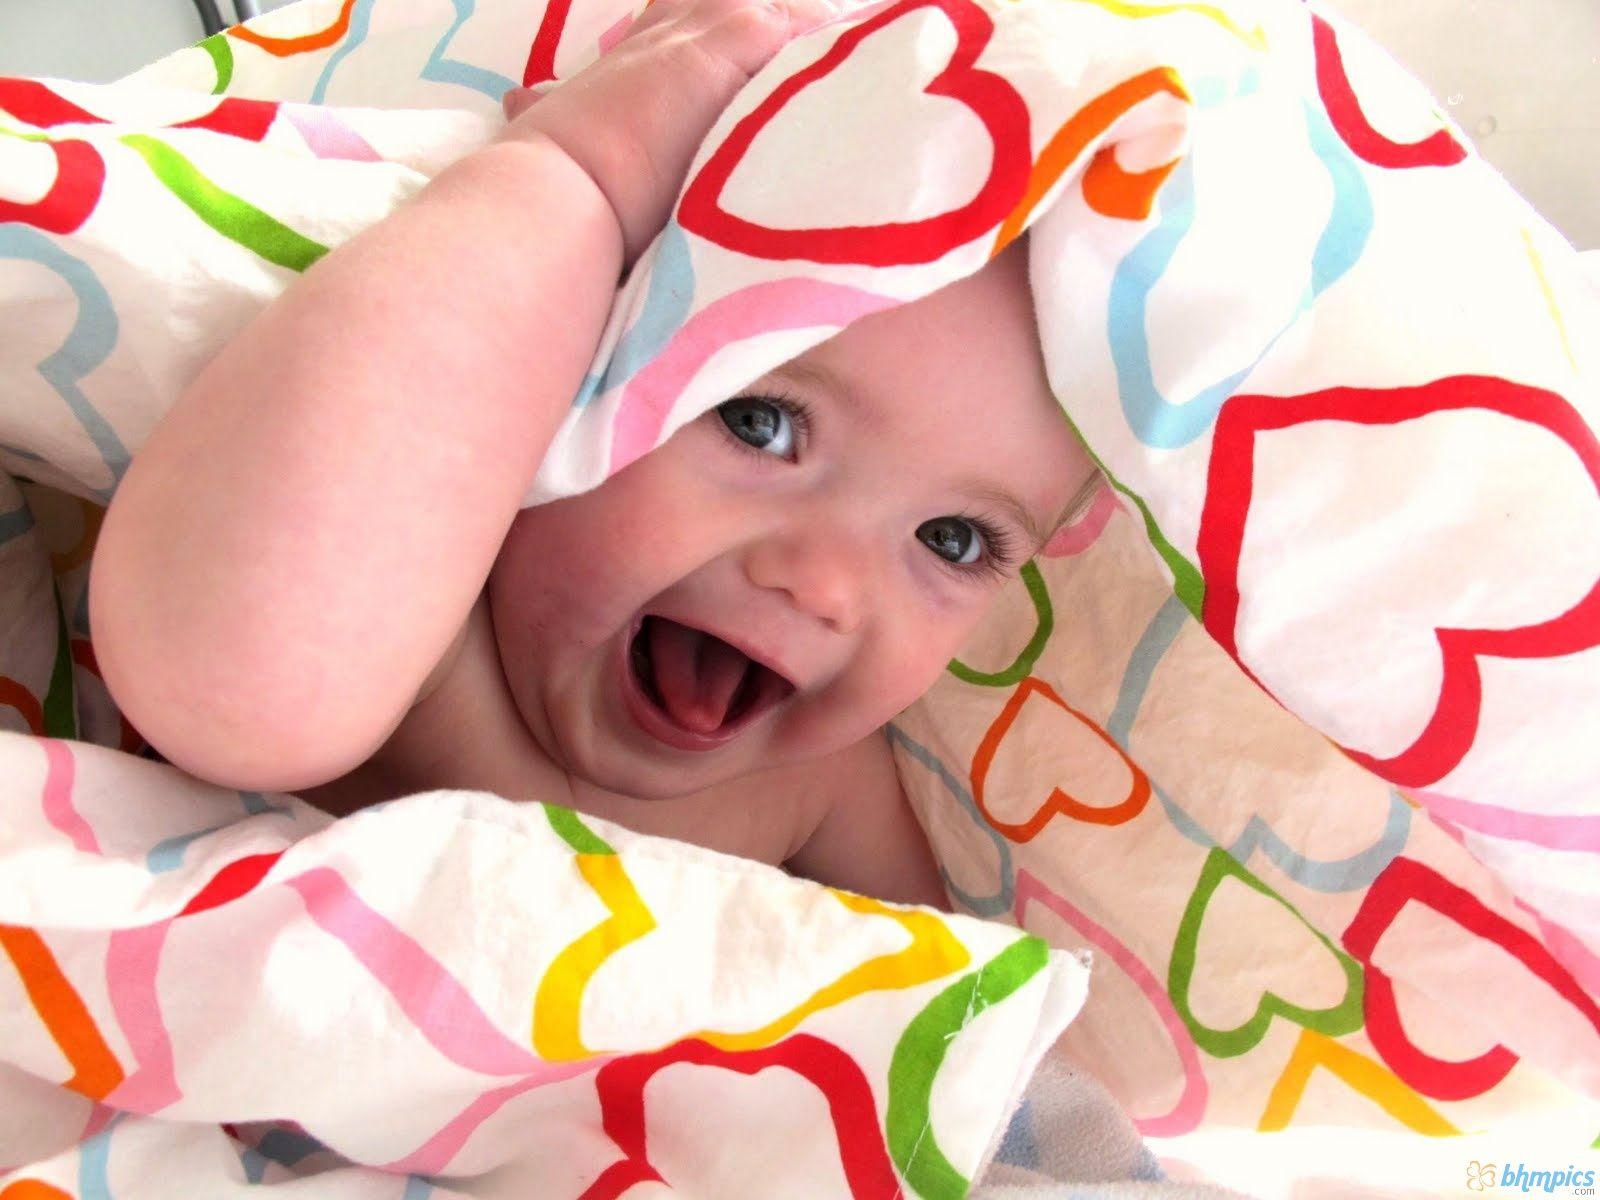 Wallpaper Bambini ~ Cute baby desktop wallpapers this wallpaper wallpapers